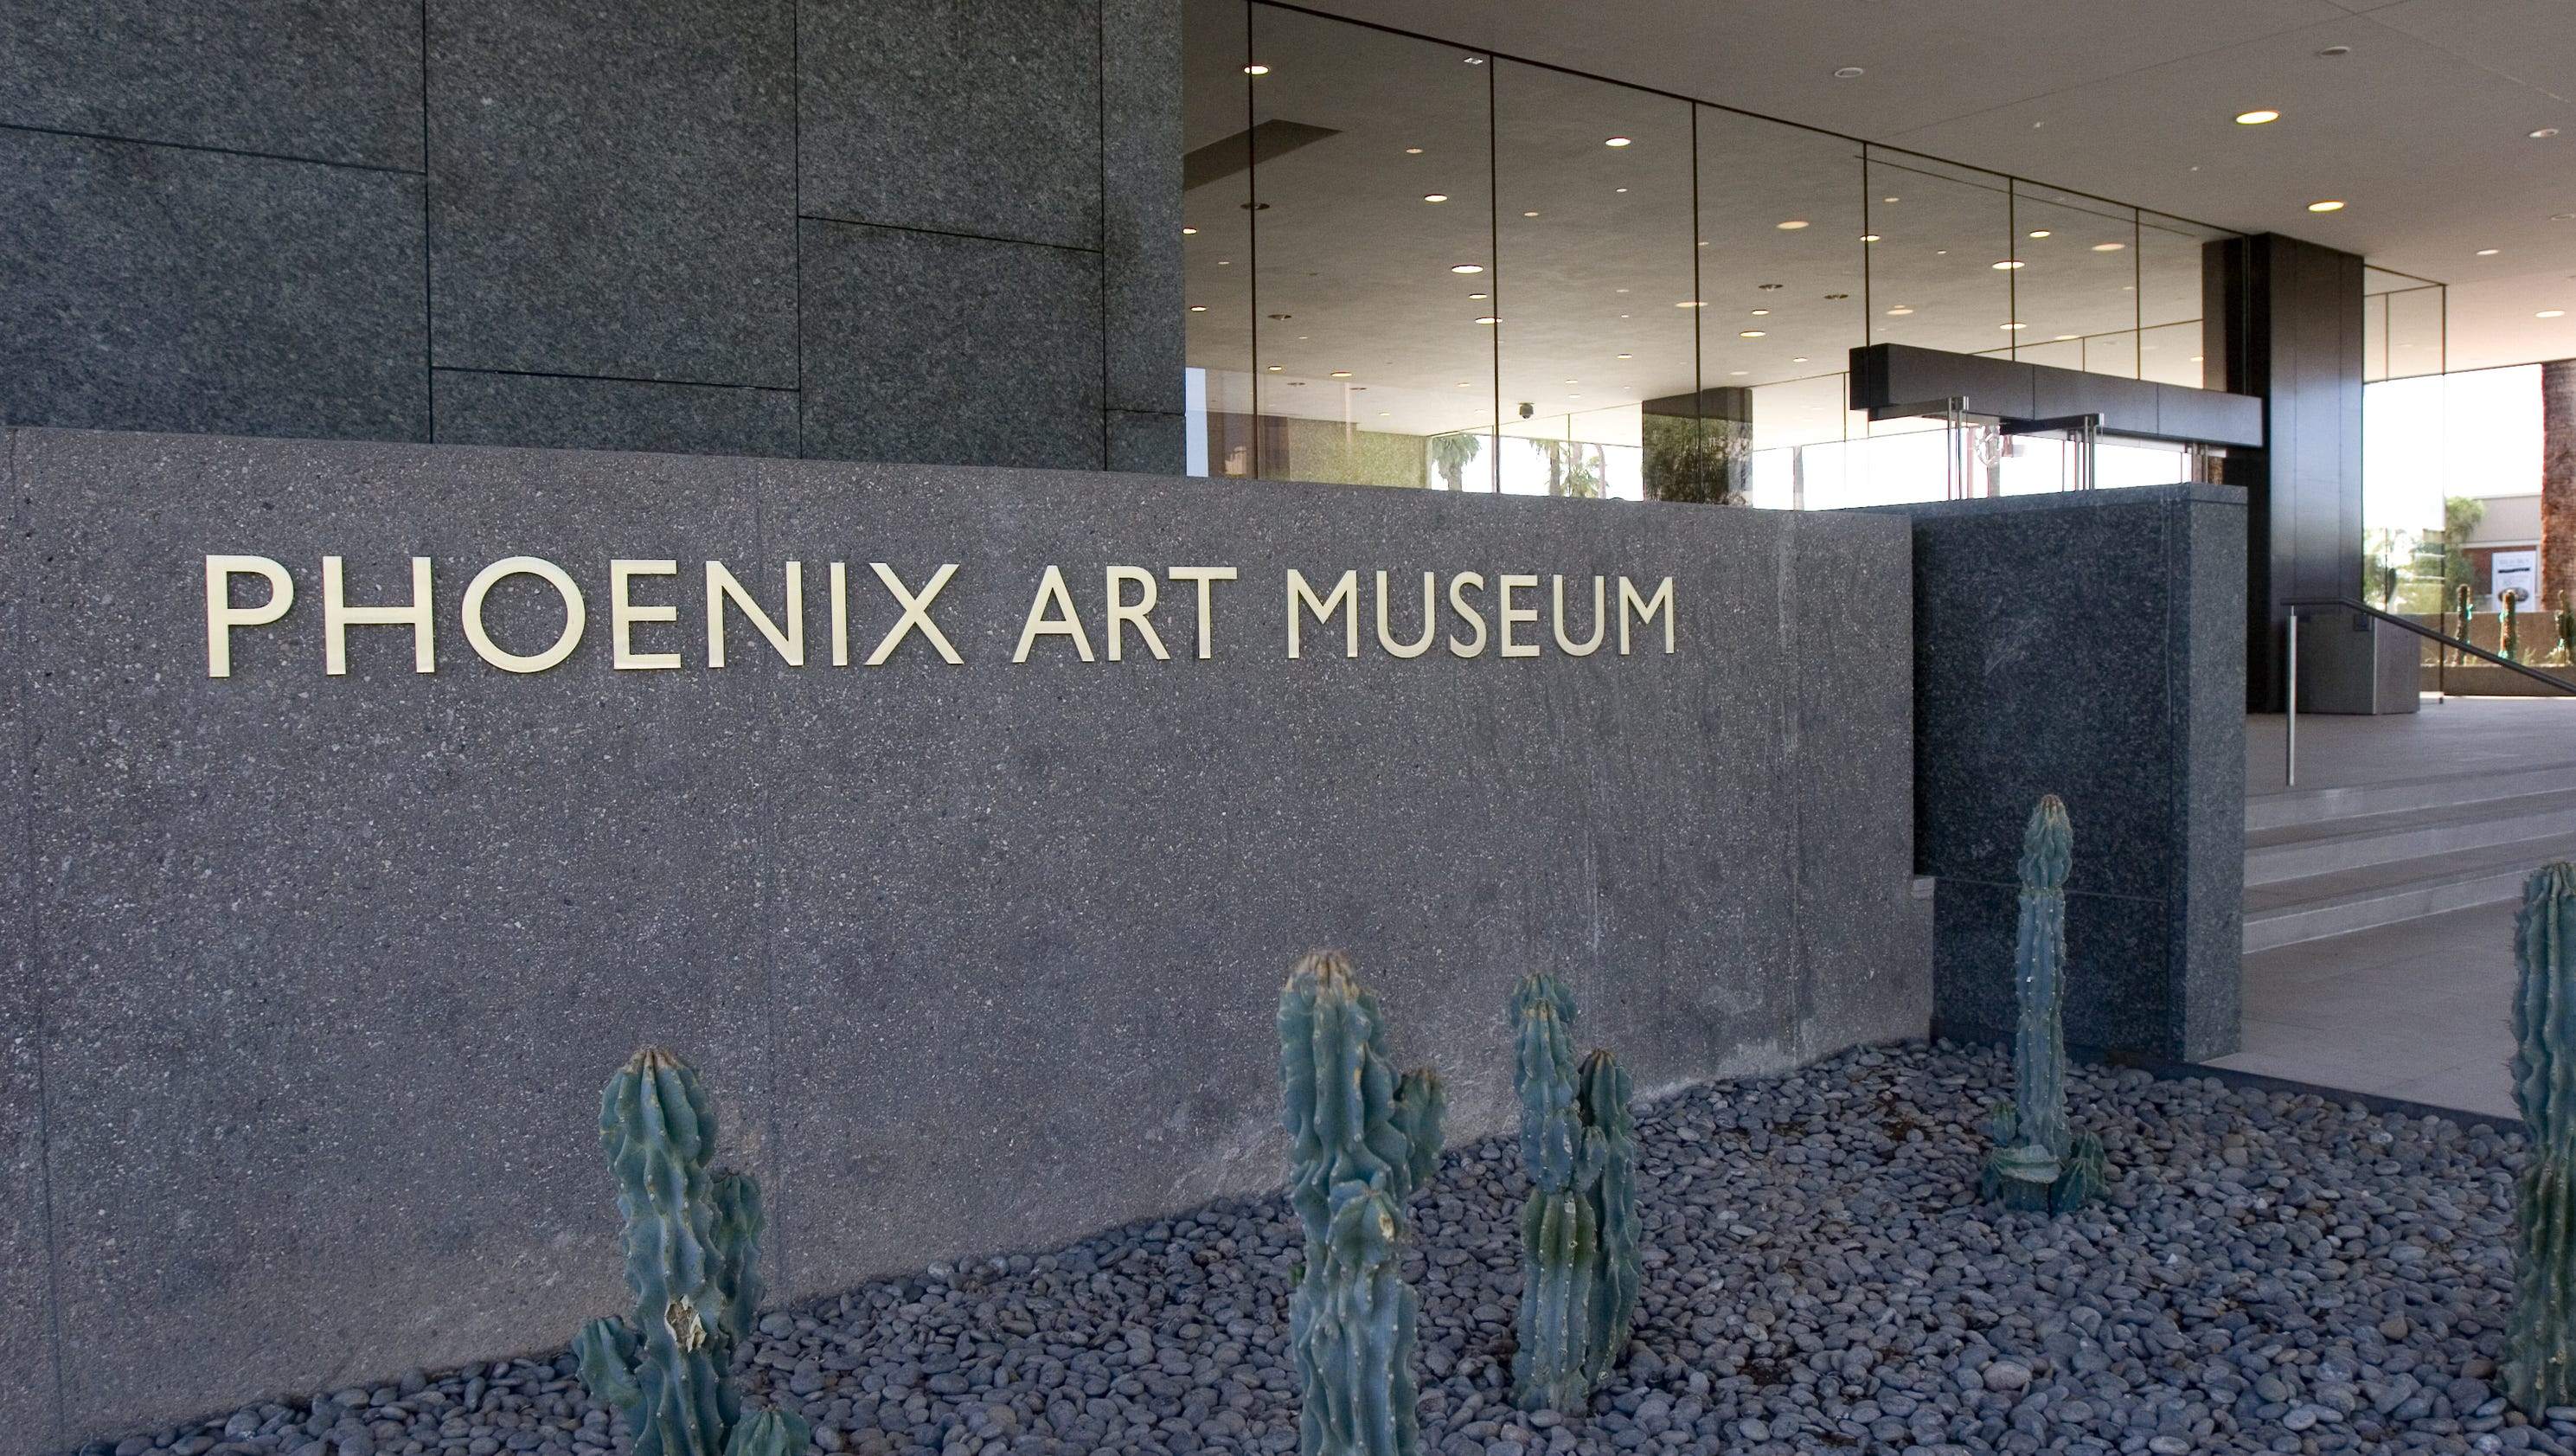 Phoenix Art Museum Hirings Firings And A New Vision